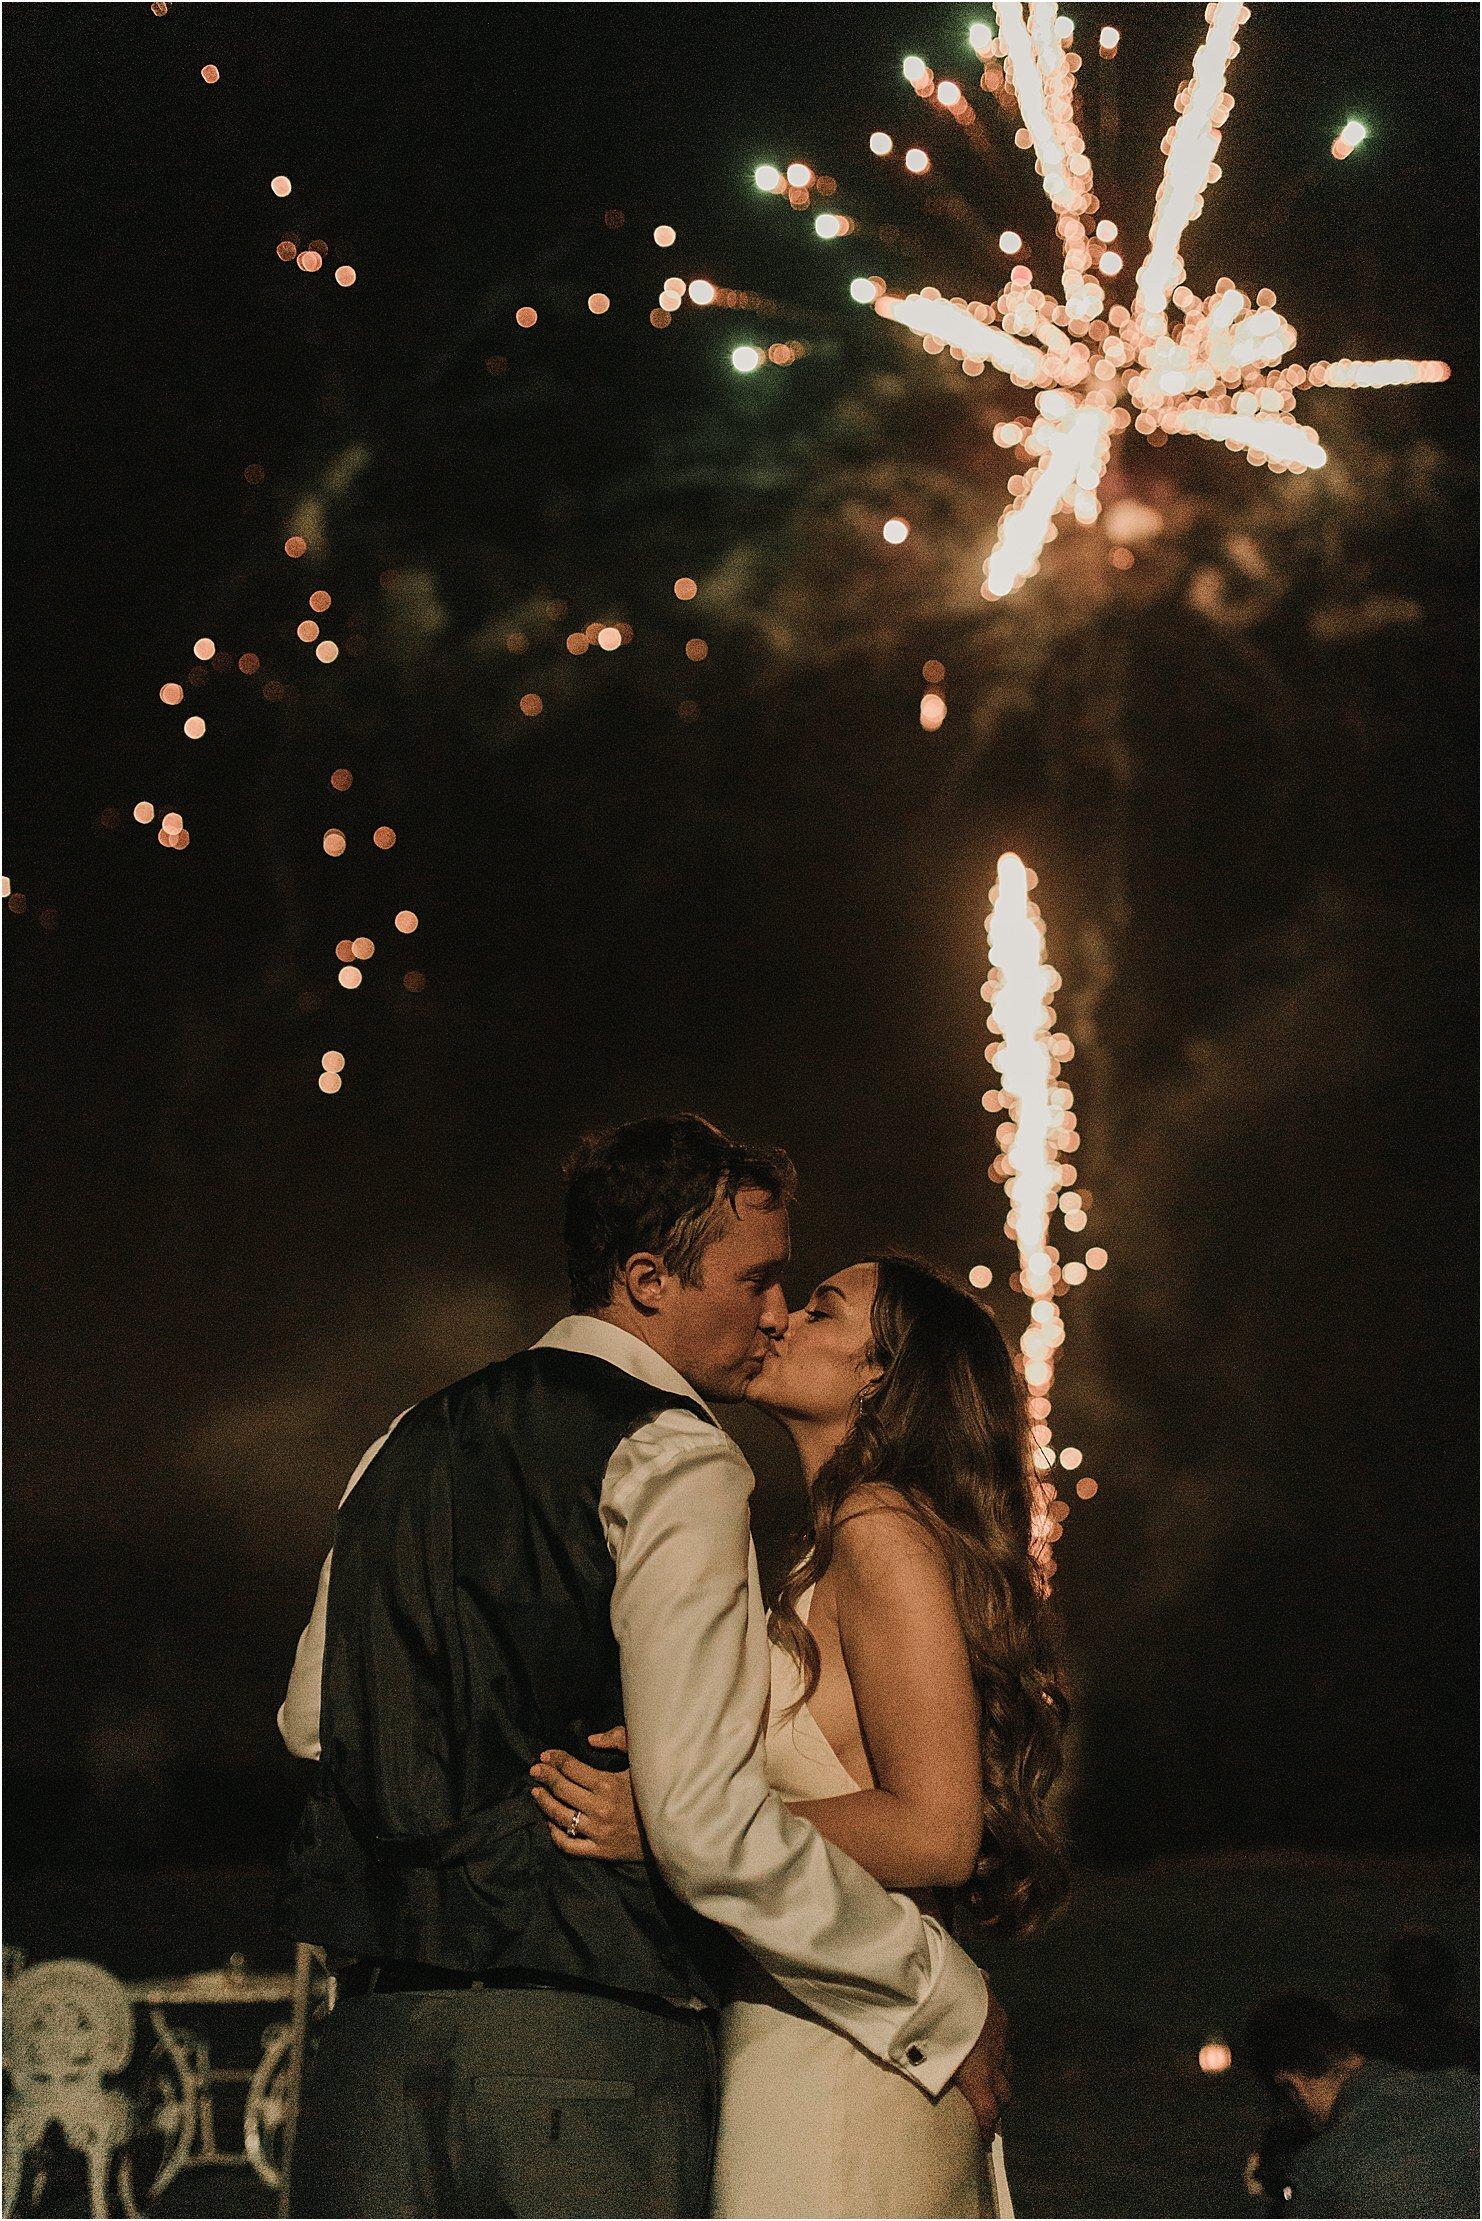 boda-de-cuento-en-castillo-boda-en-londres-89.jpg